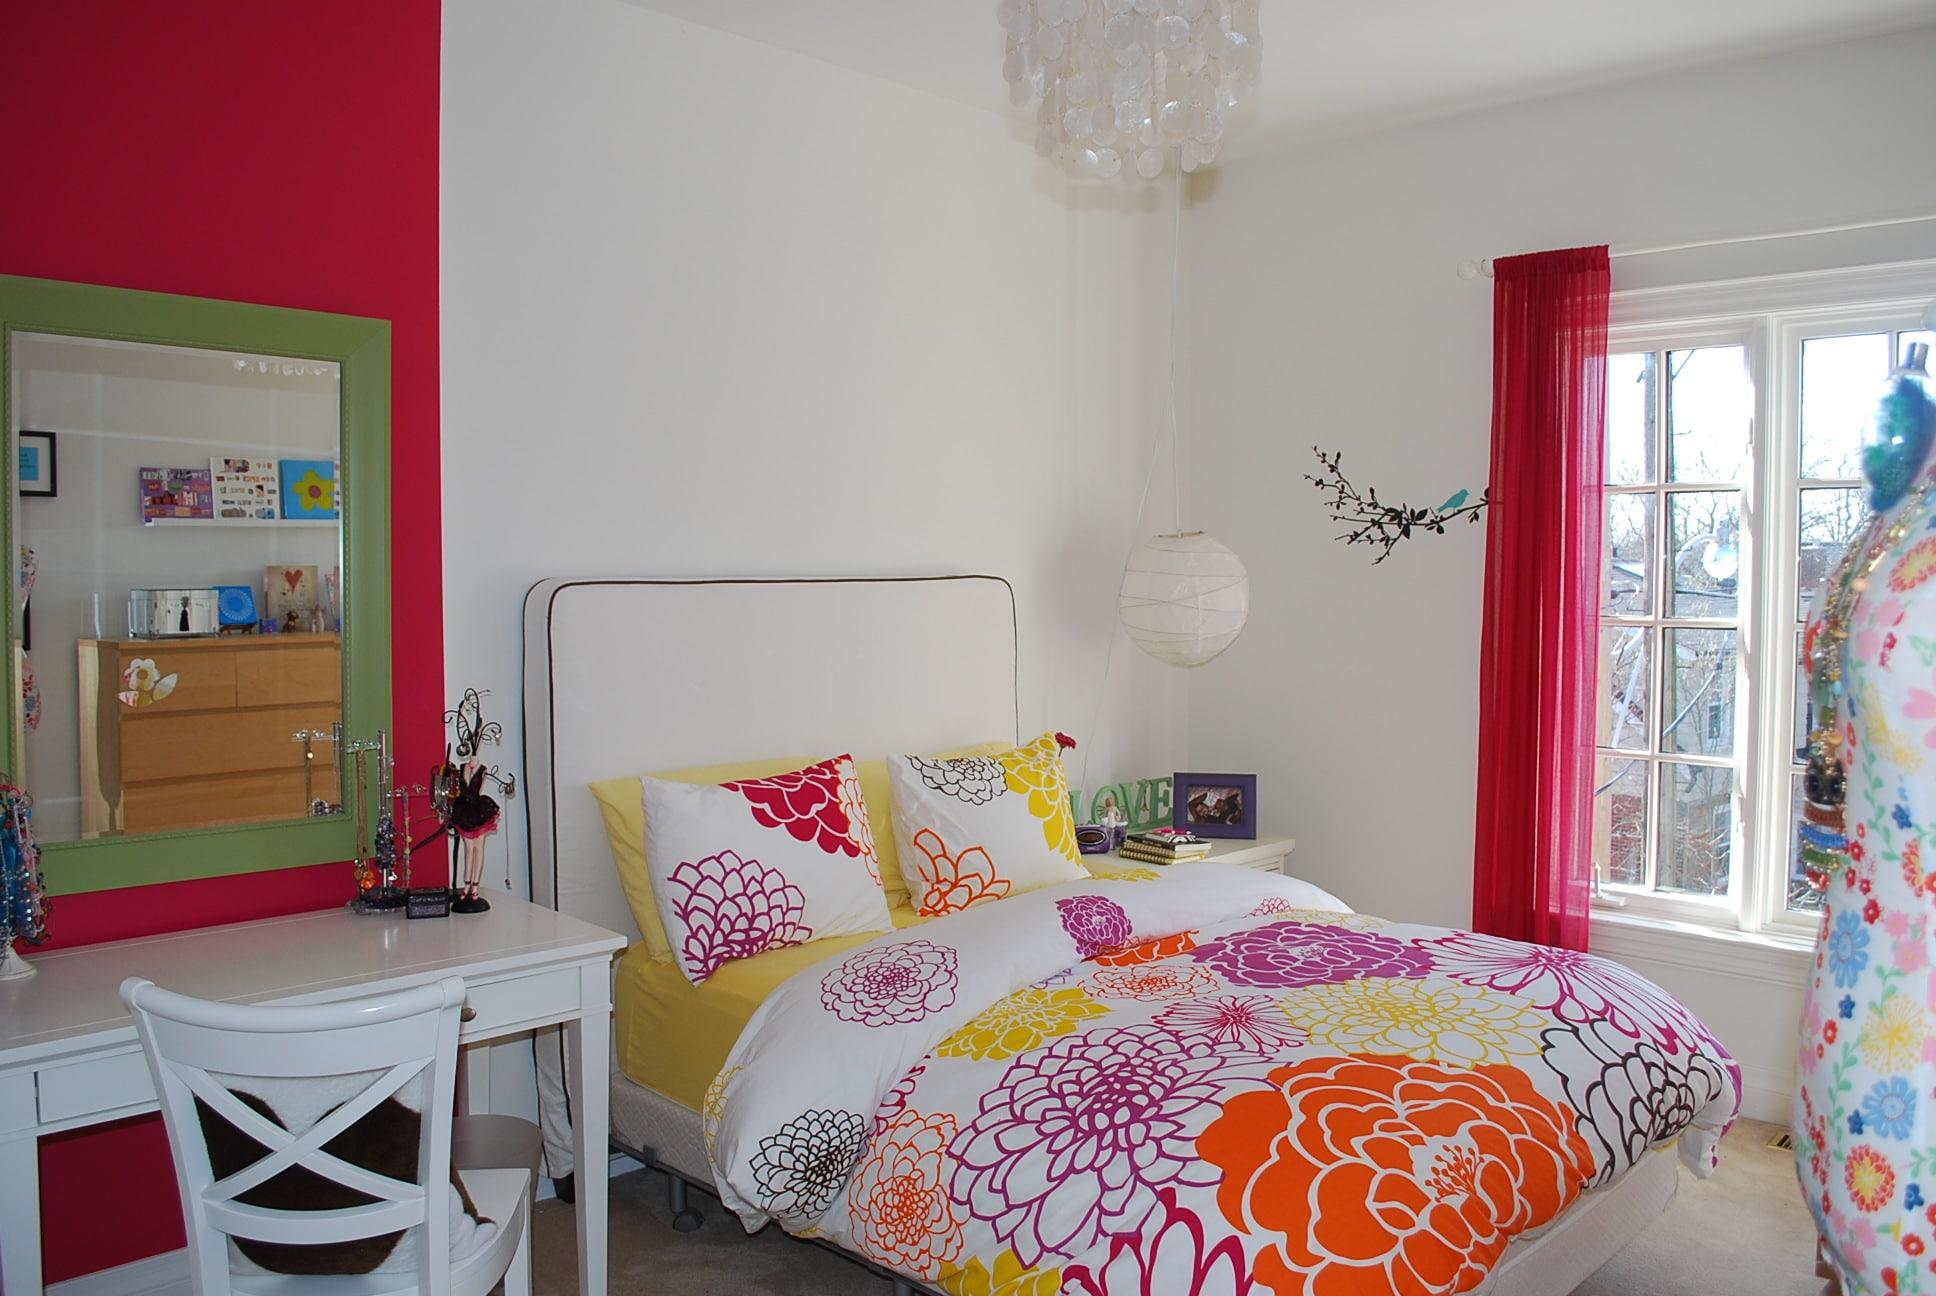 girl room blanco con flores